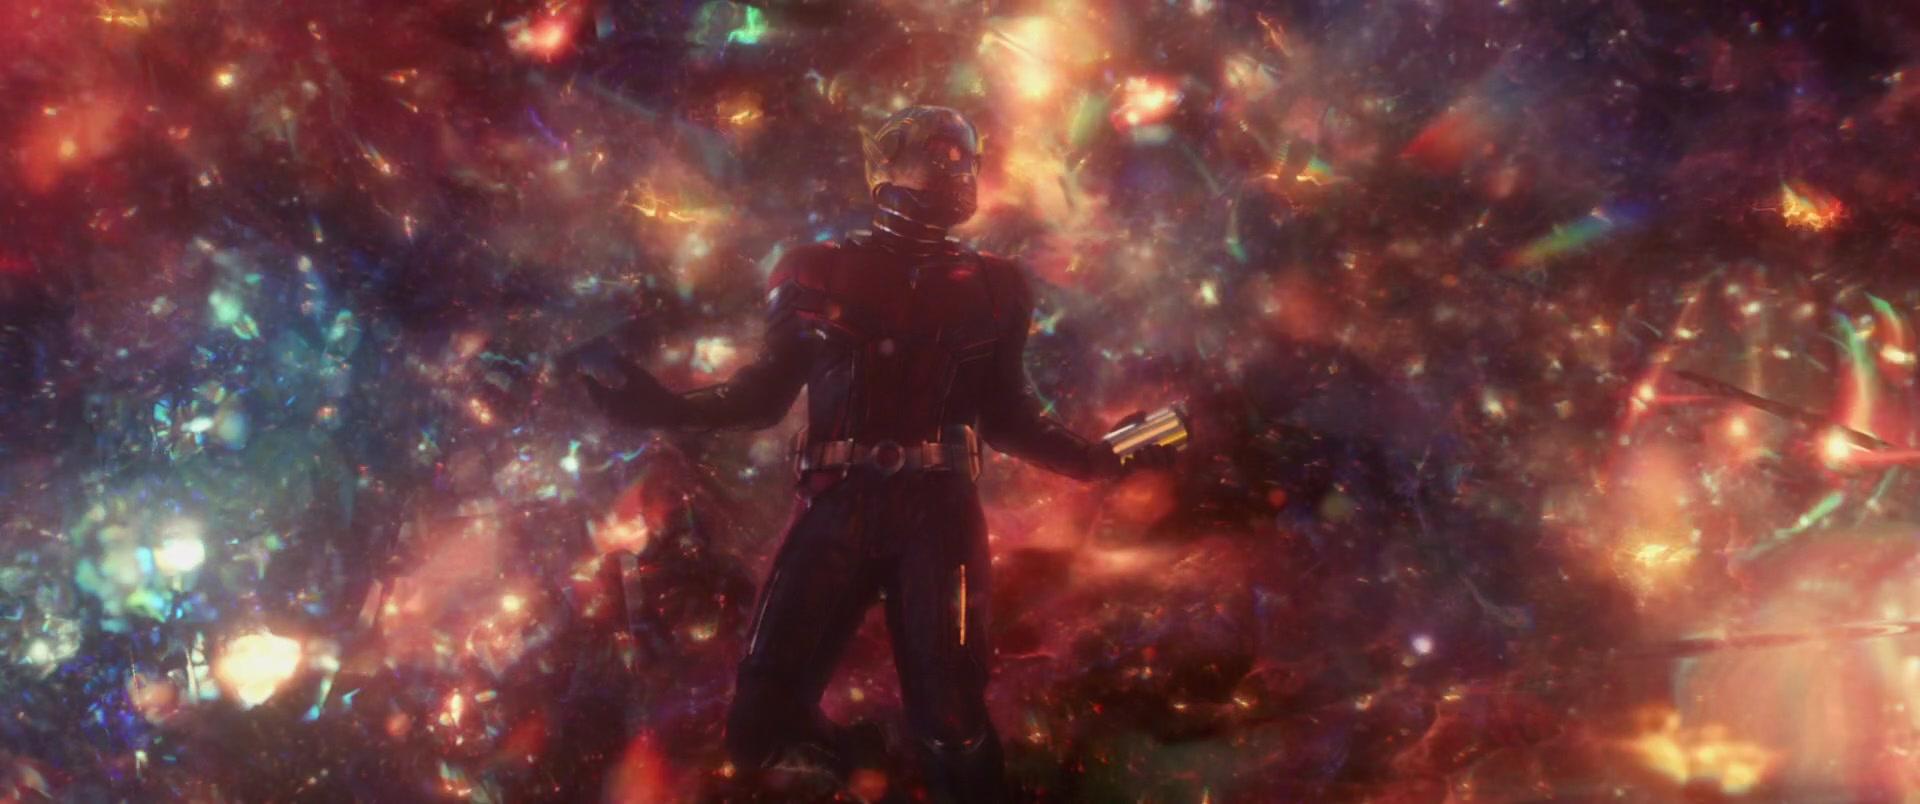 Ant-Man در Avengers Endgame